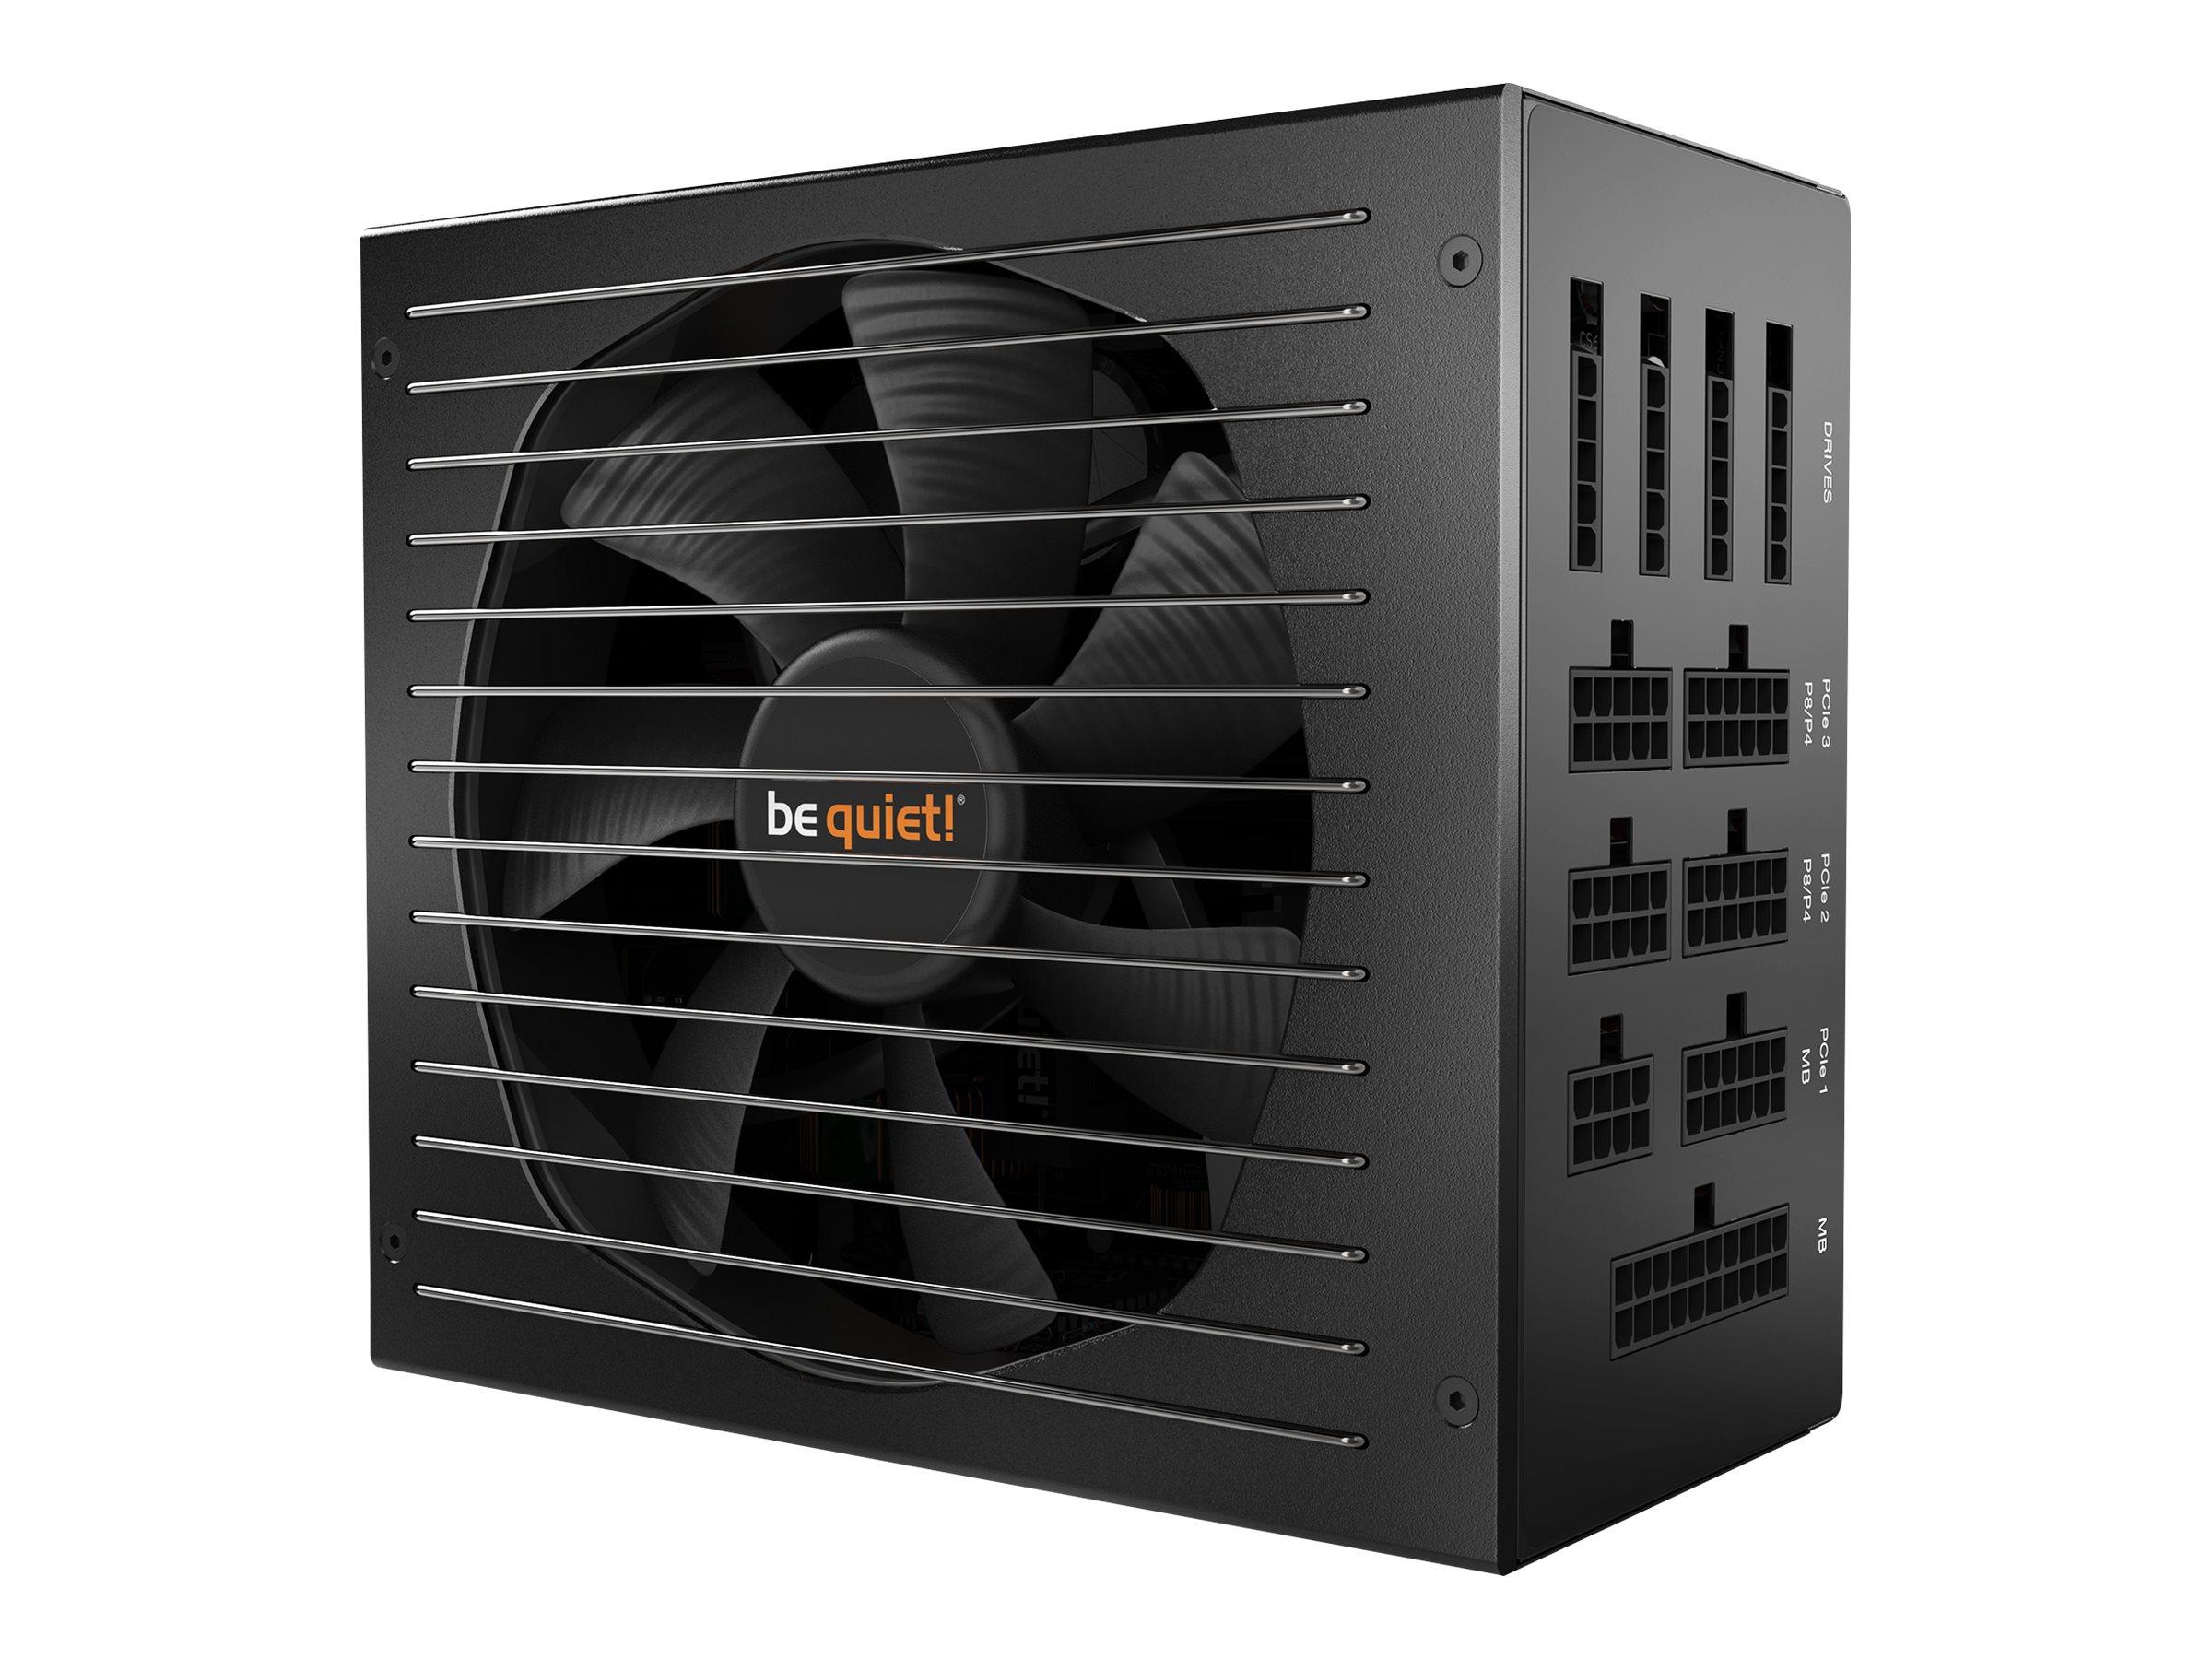 be quiet! Straight Power 11 850W - Stromversorgung (intern) - ATX12V 2.4/ EPS12V 2.92 - 80 PLUS Gold - Wechselstrom 100-240 V -